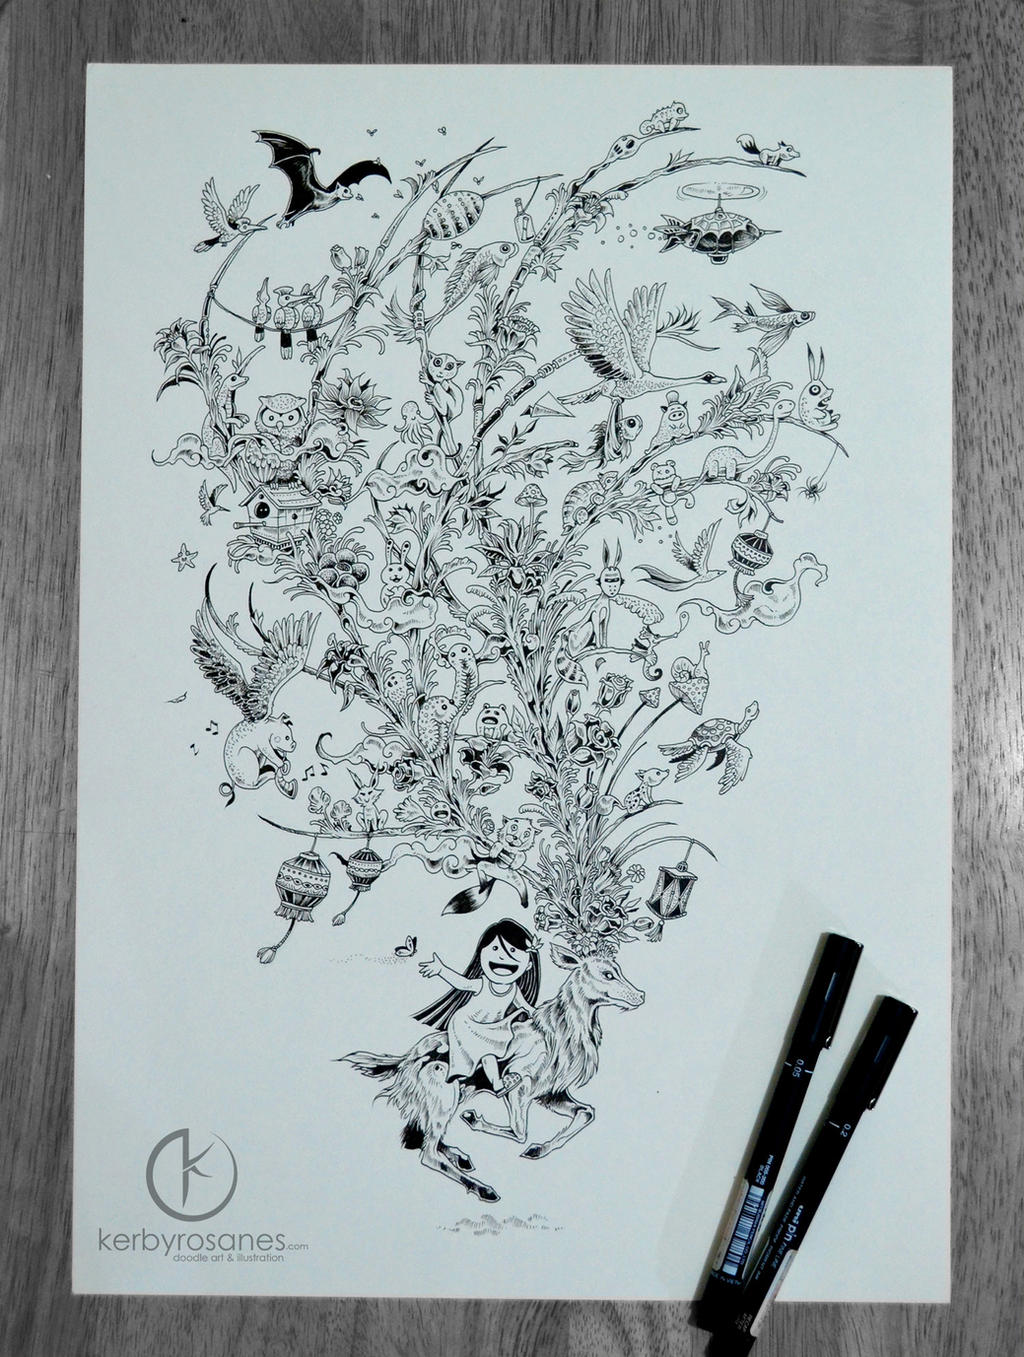 MIGRATION by kerbyrosanes